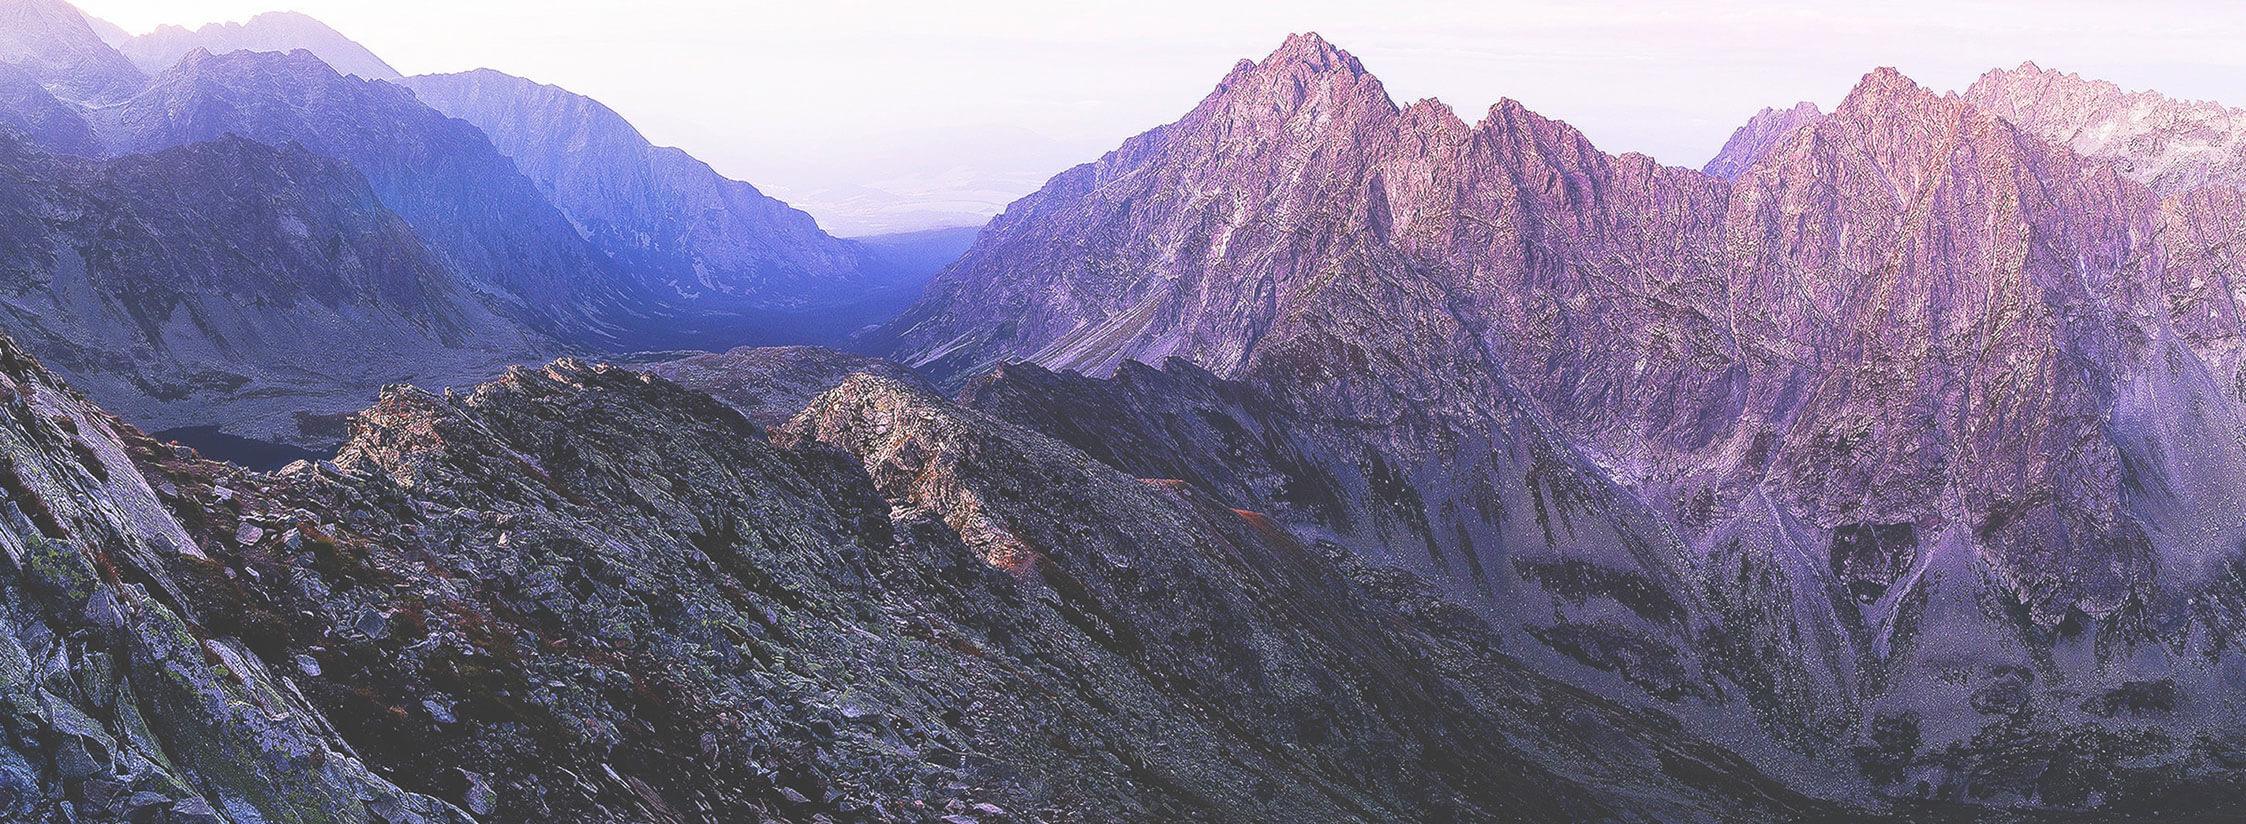 azure stack mountains